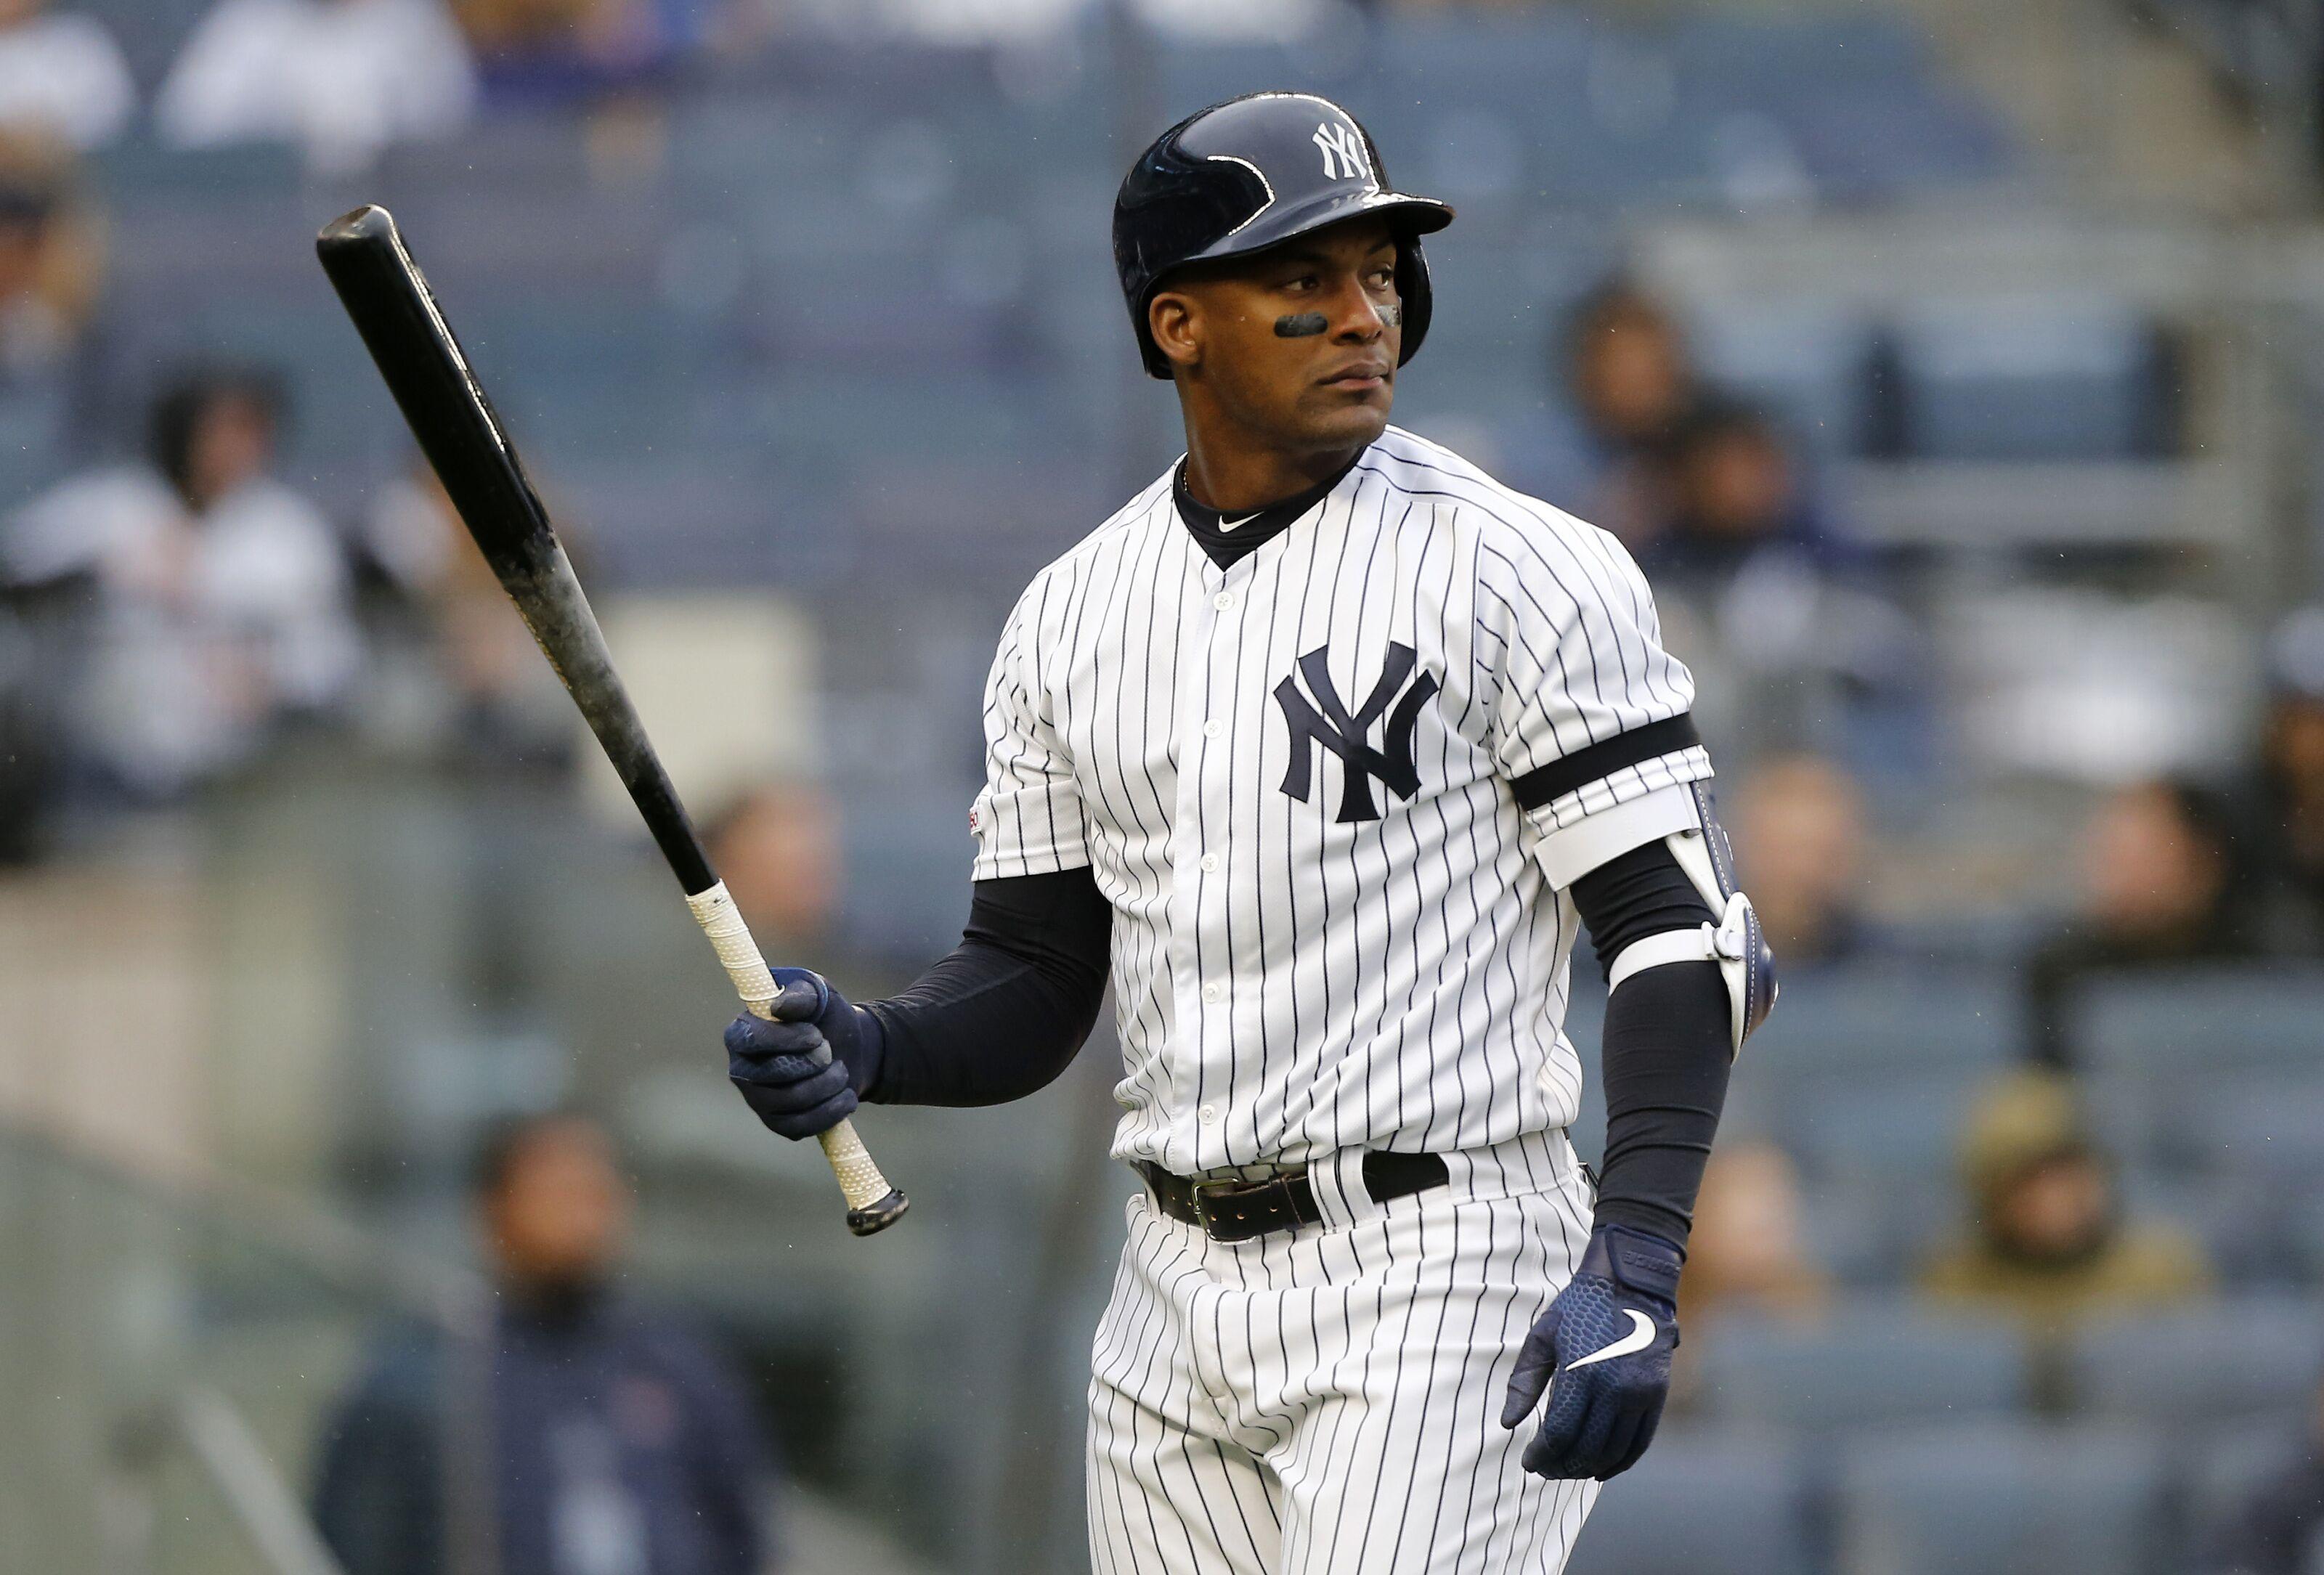 Yankees are preparing Miguel Andujar to change positions